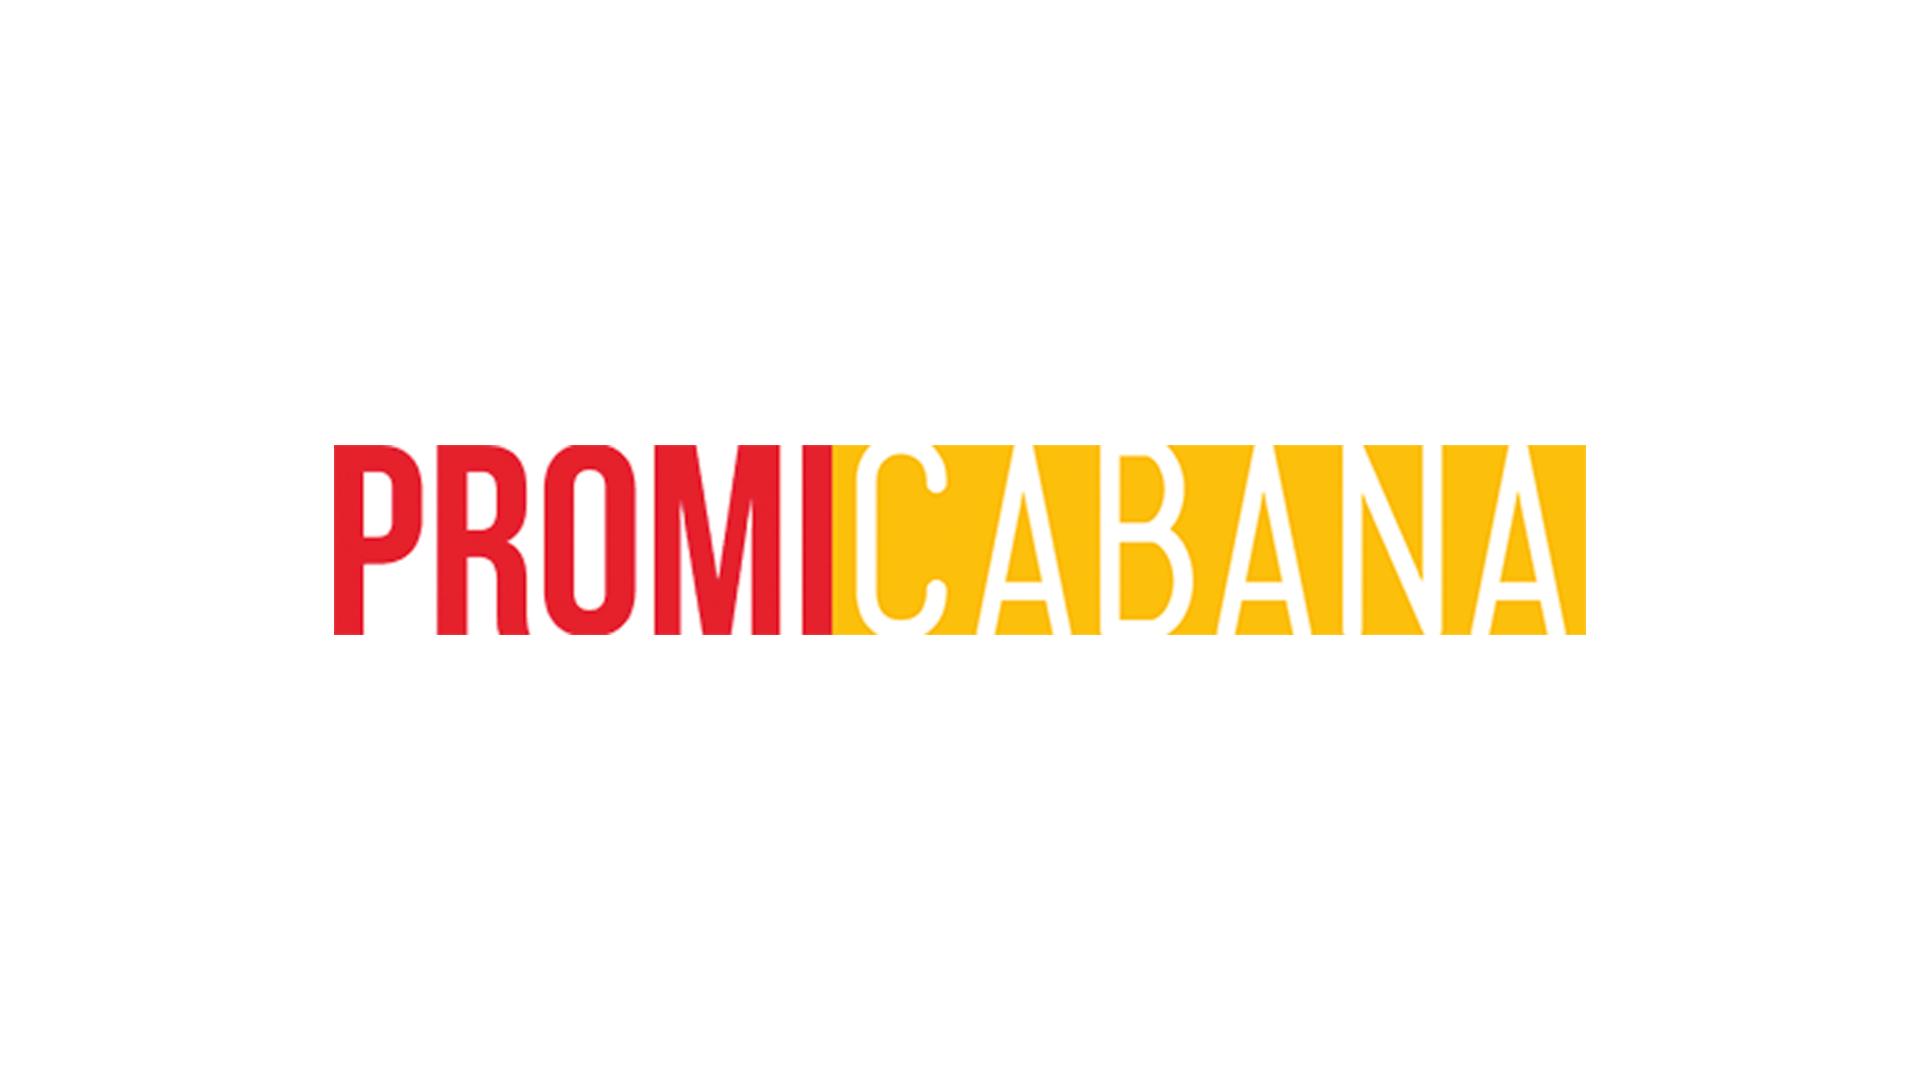 Tom Cruise Erster Die Mumie Trailer Promicabana